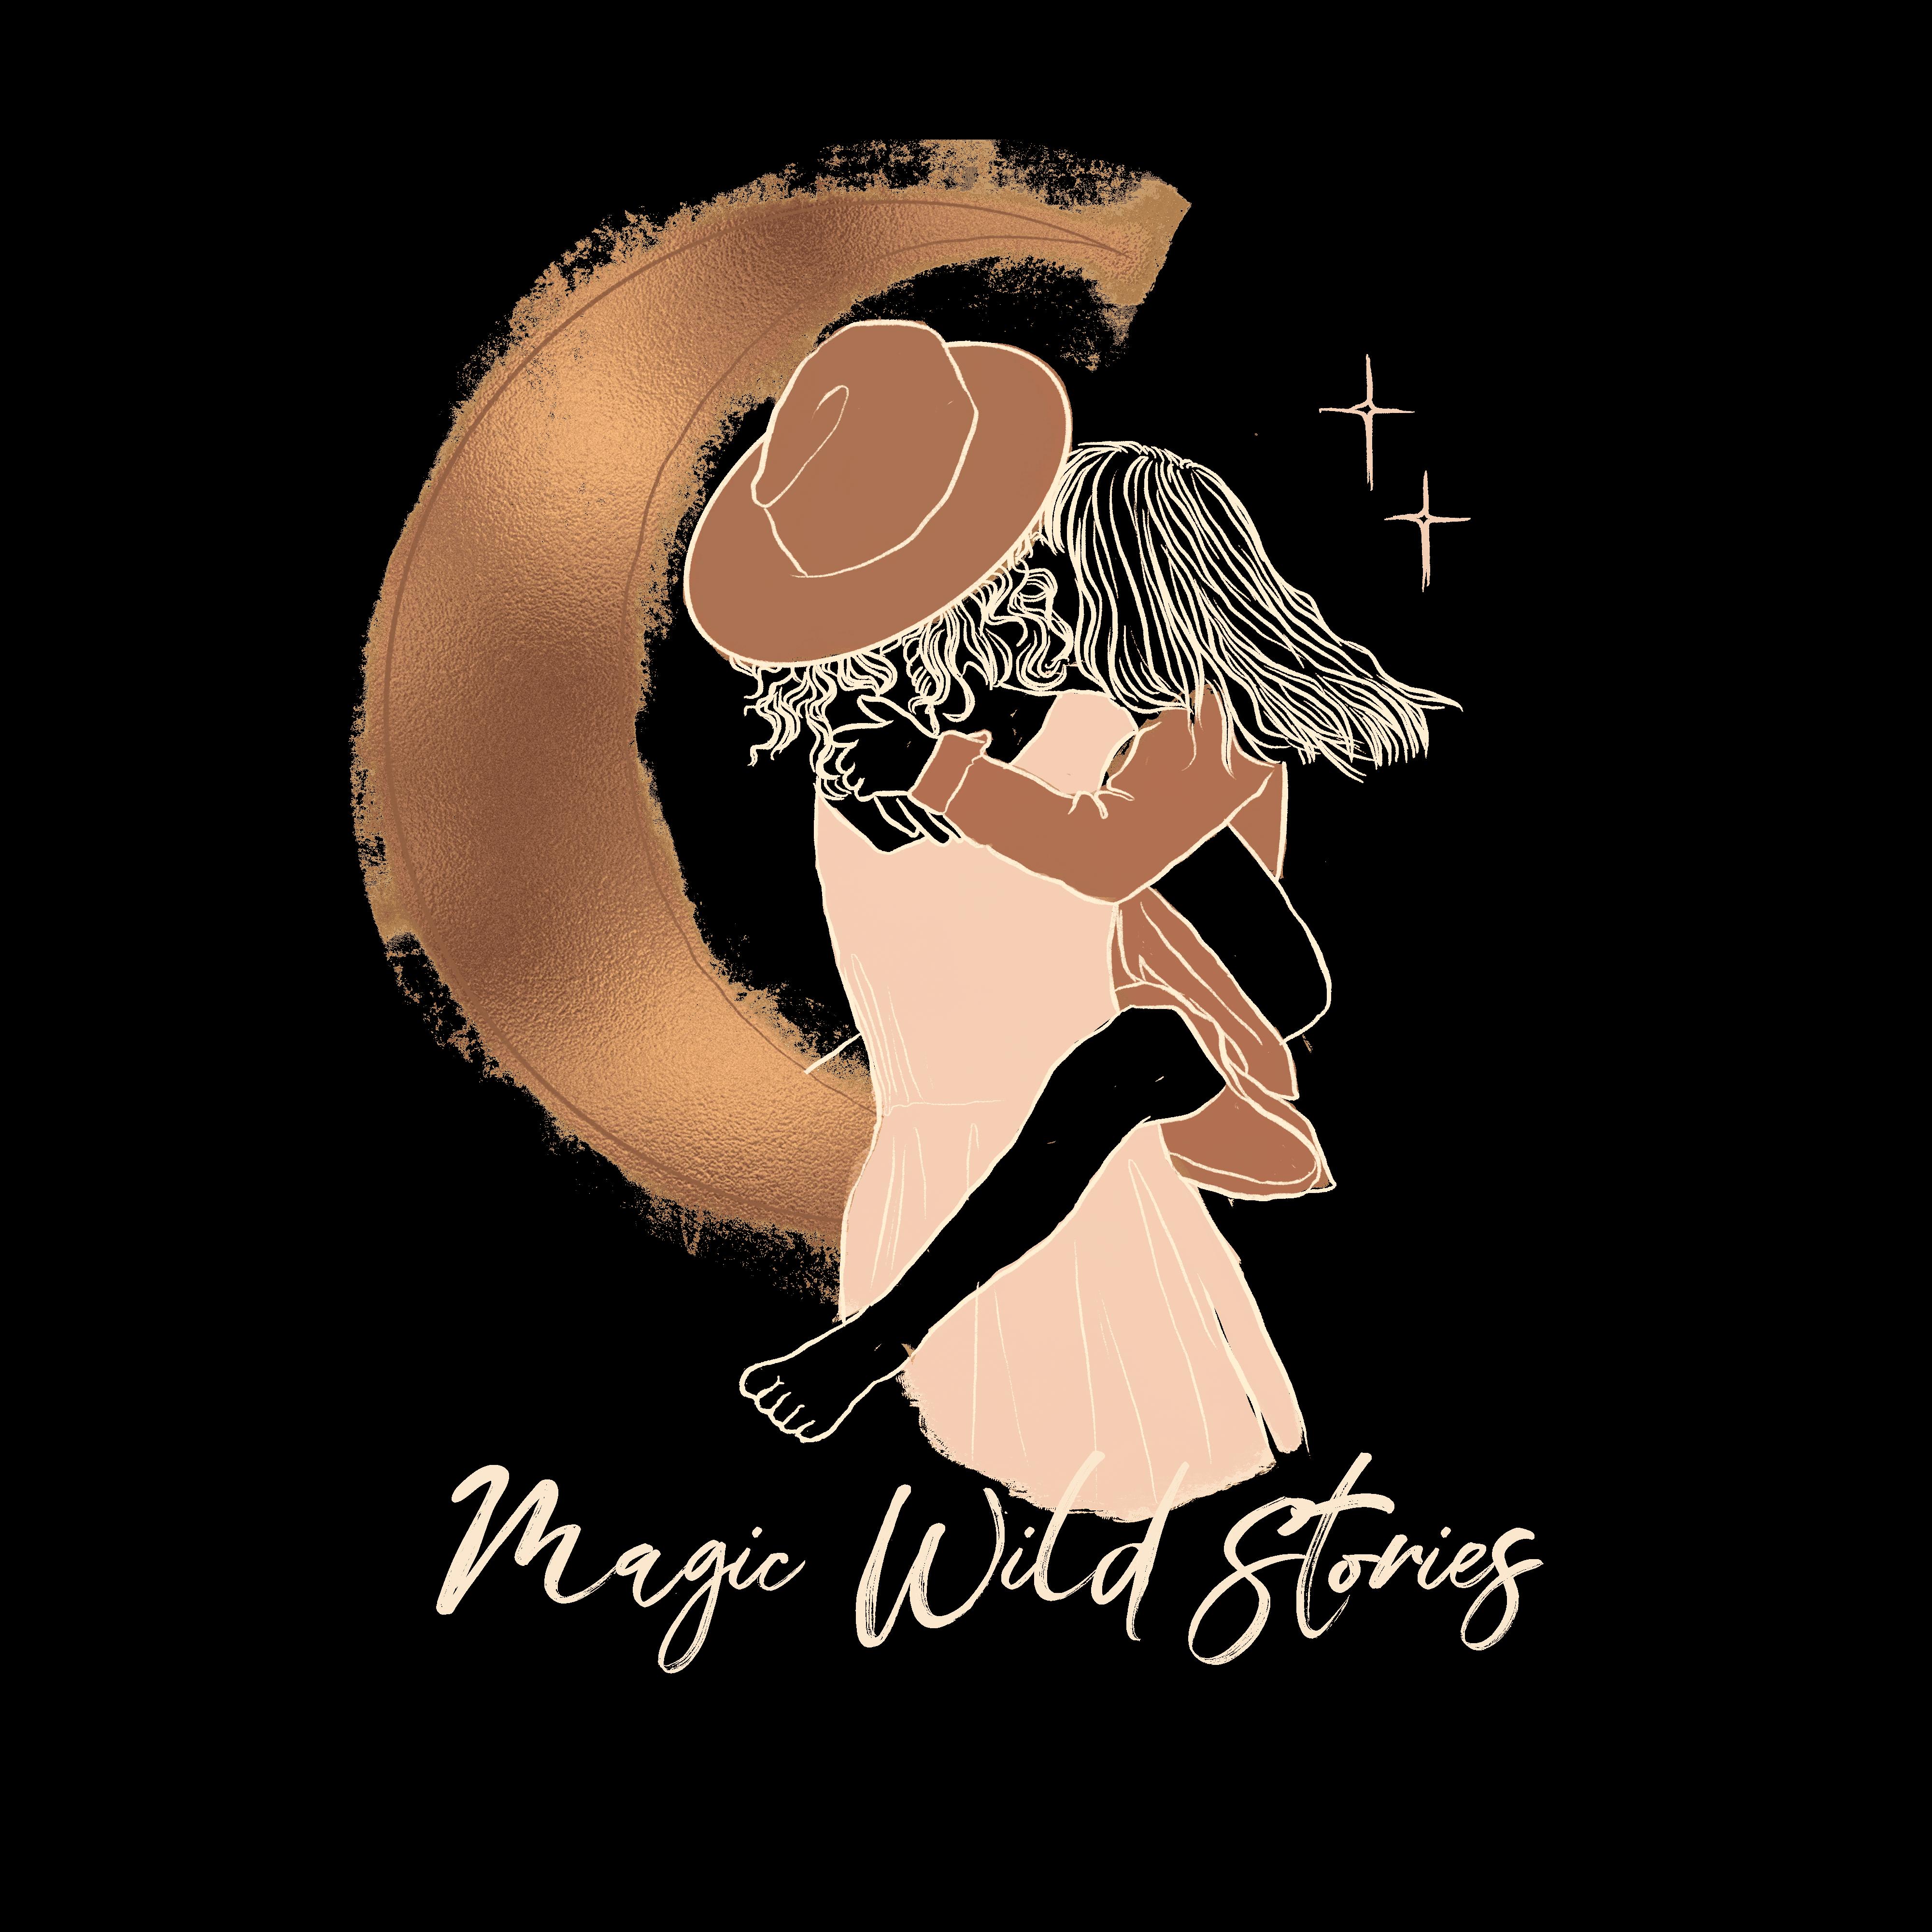 Magic Wild Stories